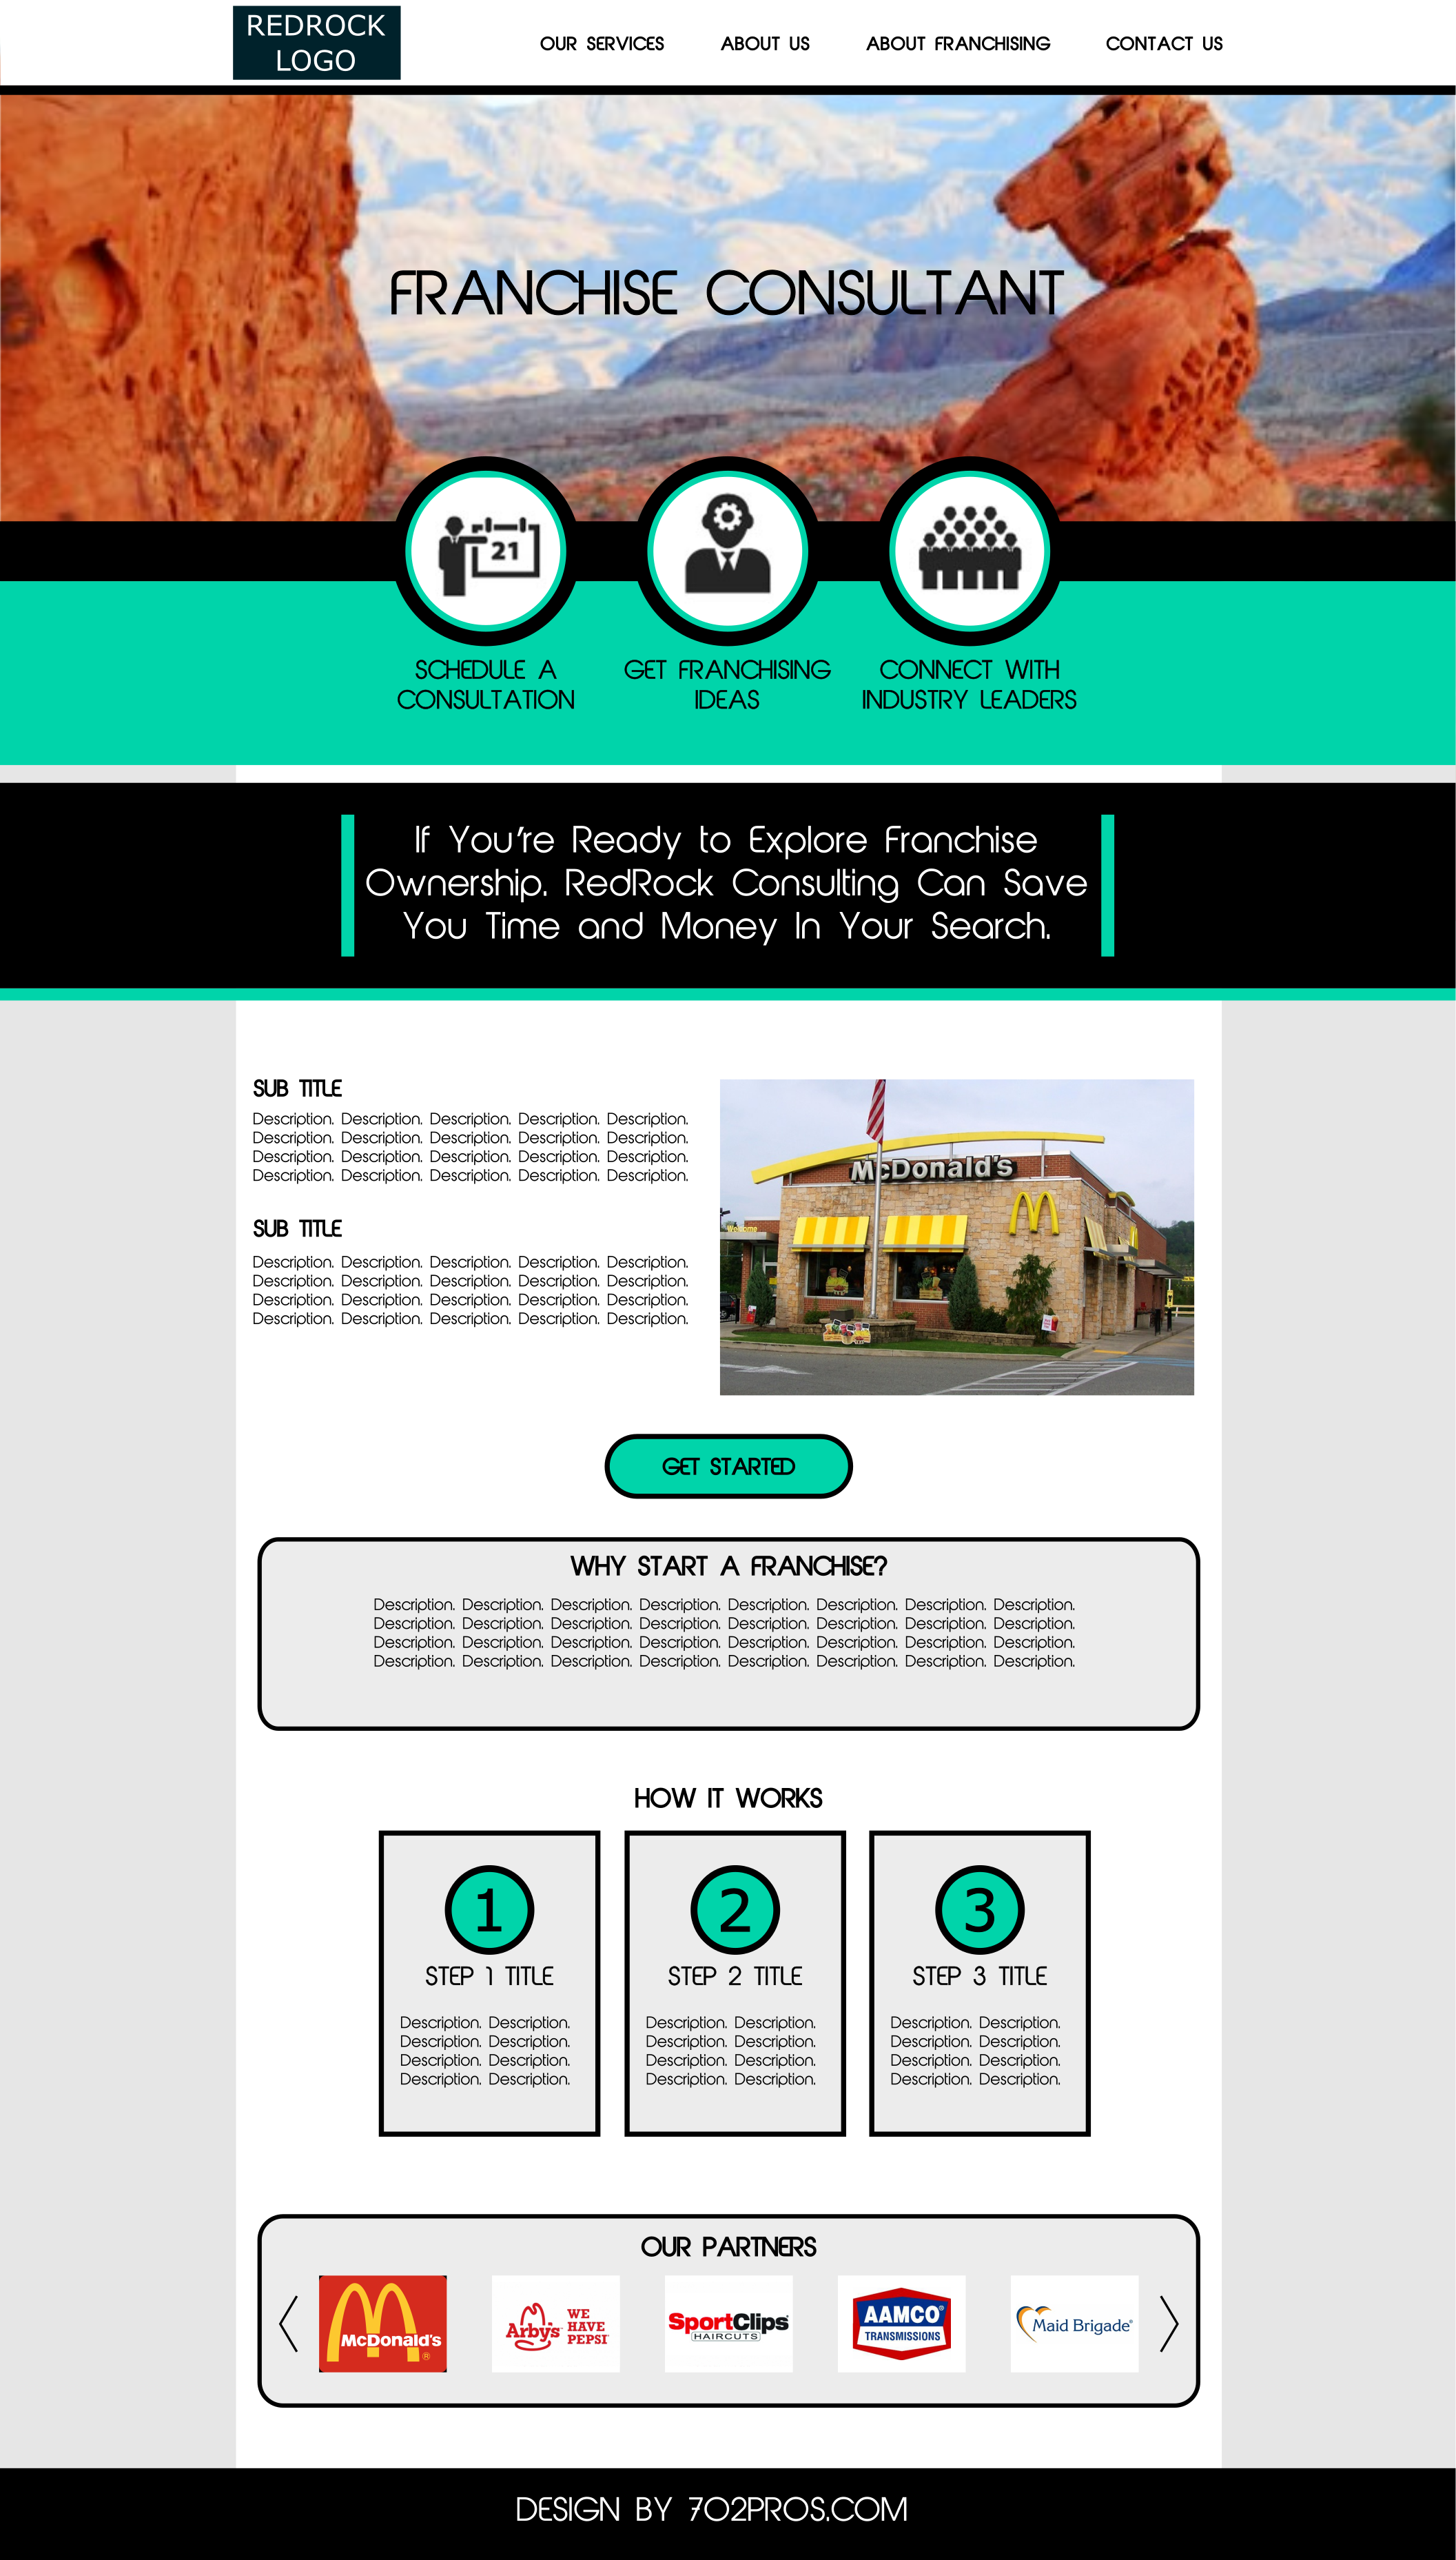 redrock website design mockup